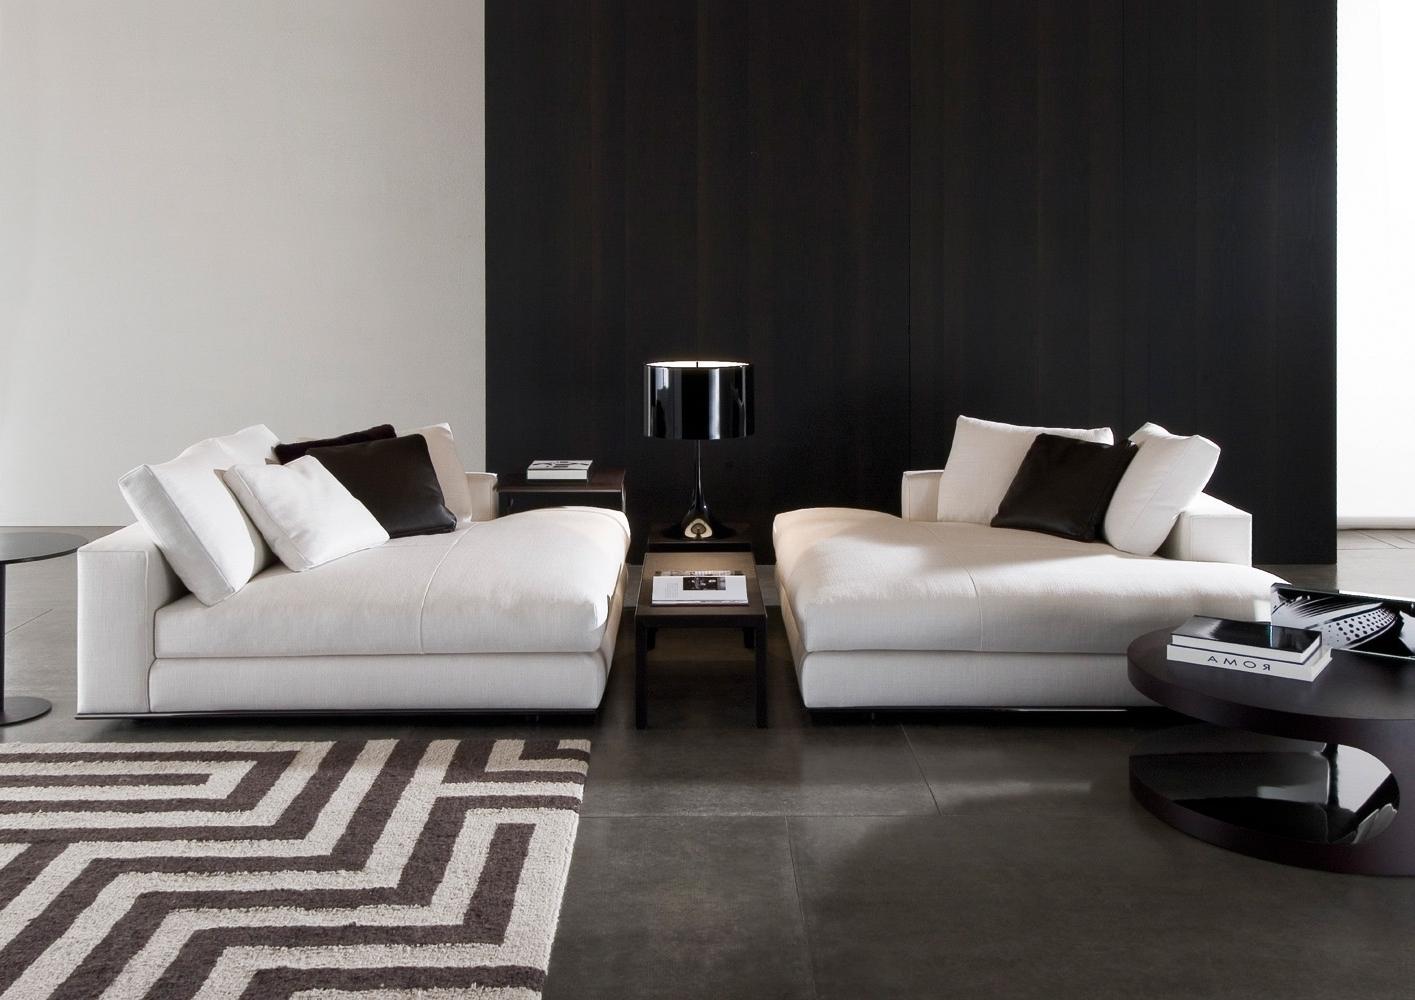 Modular Sofa Hamilton Sofa, Minotti – Luxury Furniture Mr For Well Known Hamilton Sectional Sofas (View 17 of 20)